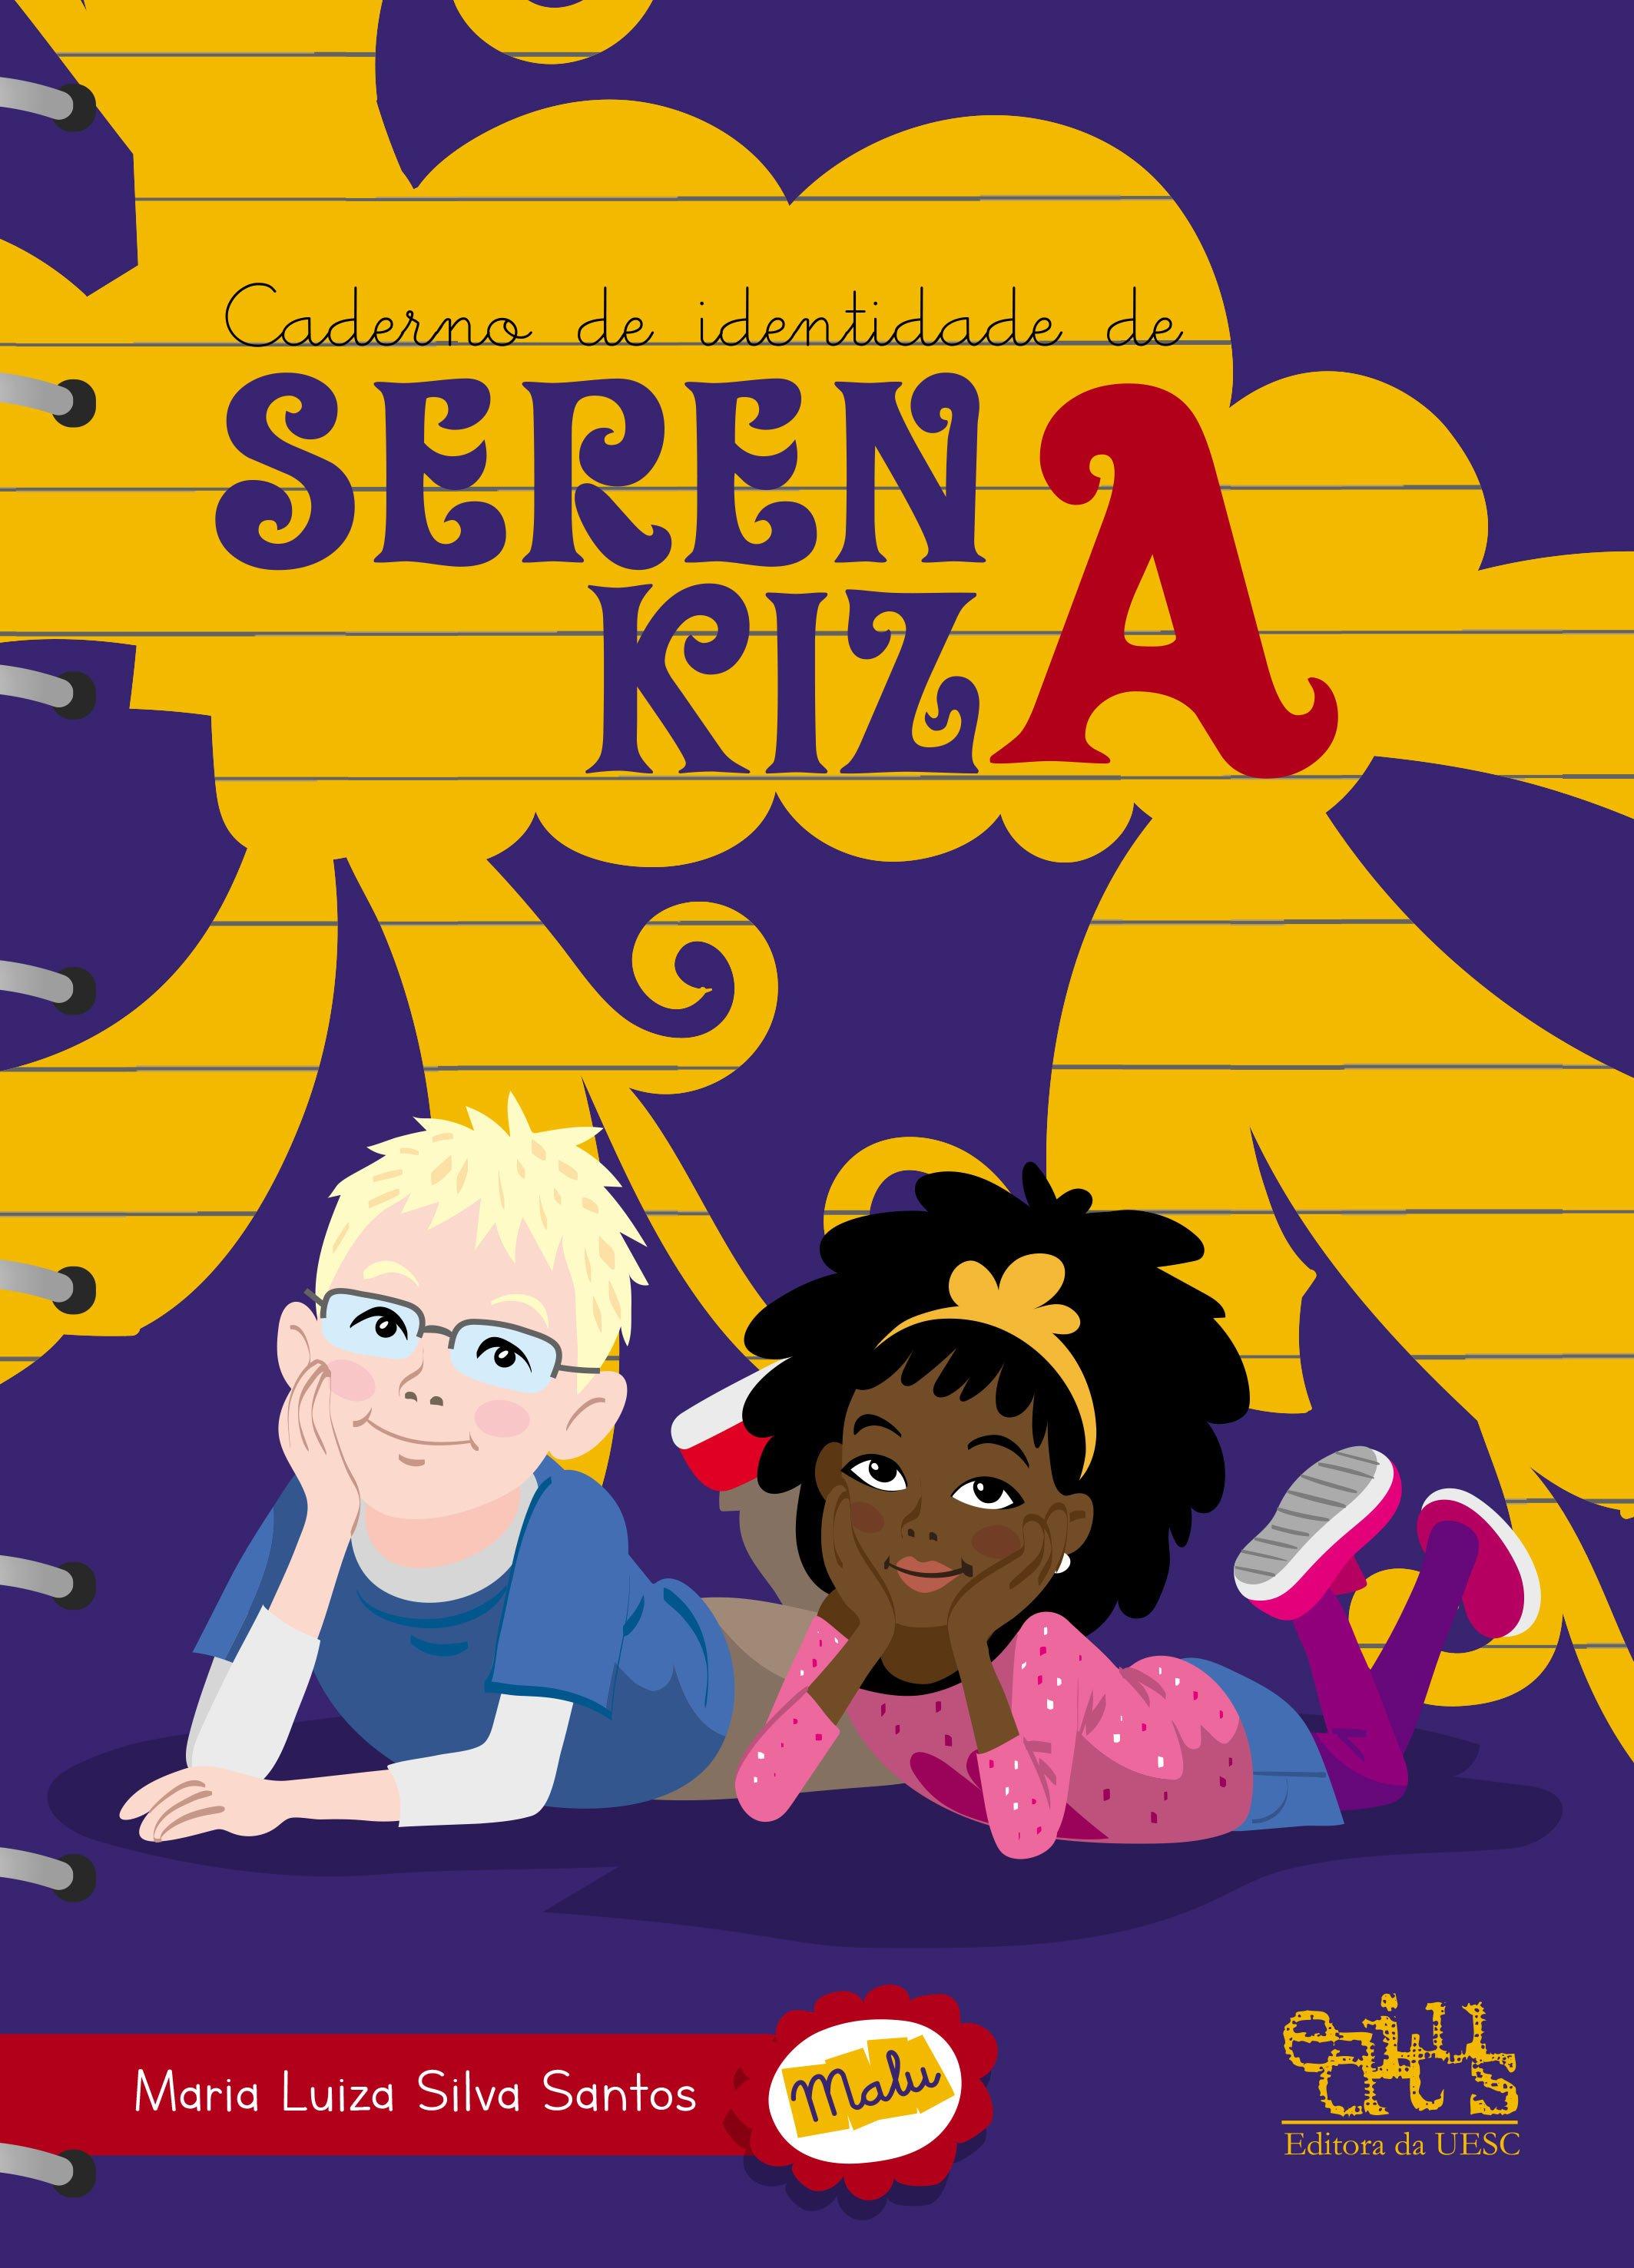 Caderno de identidade de Serena Kiza, livro de Maria Luiza Santos